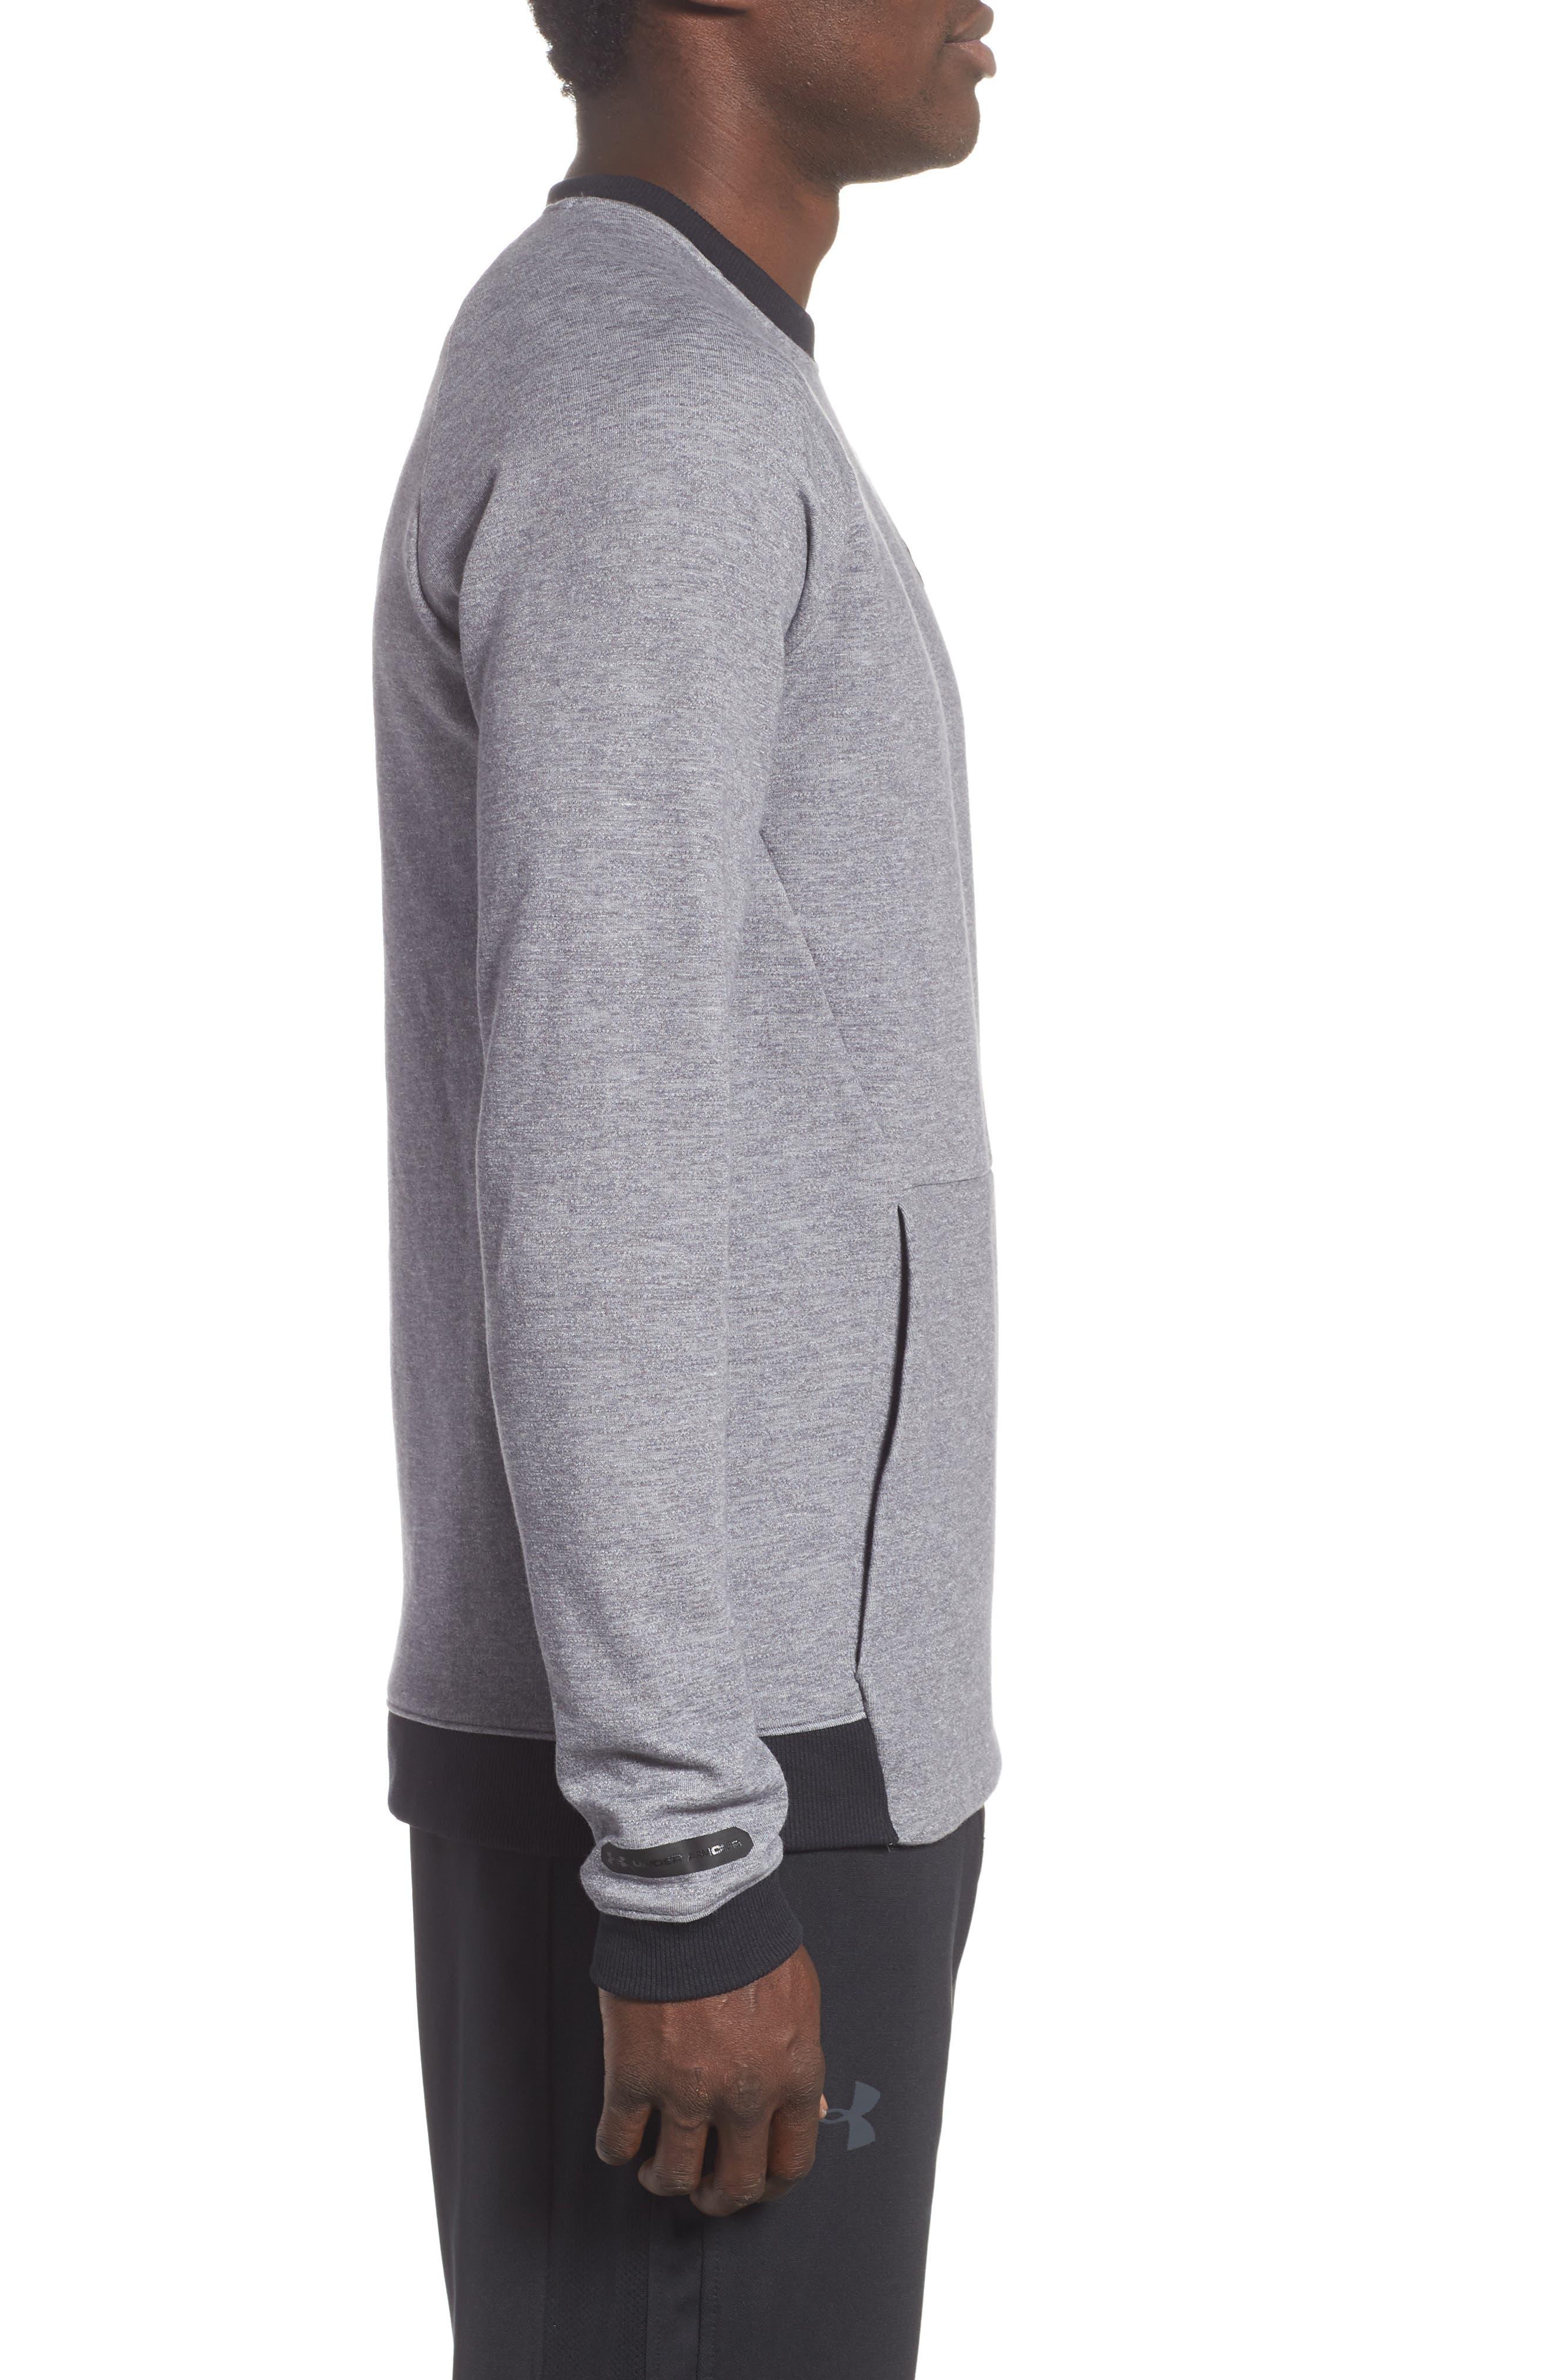 UNDER ARMOUR,                             Sportstyle 2x Crew Sweatshirt,                             Alternate thumbnail 3, color,                             STEEL